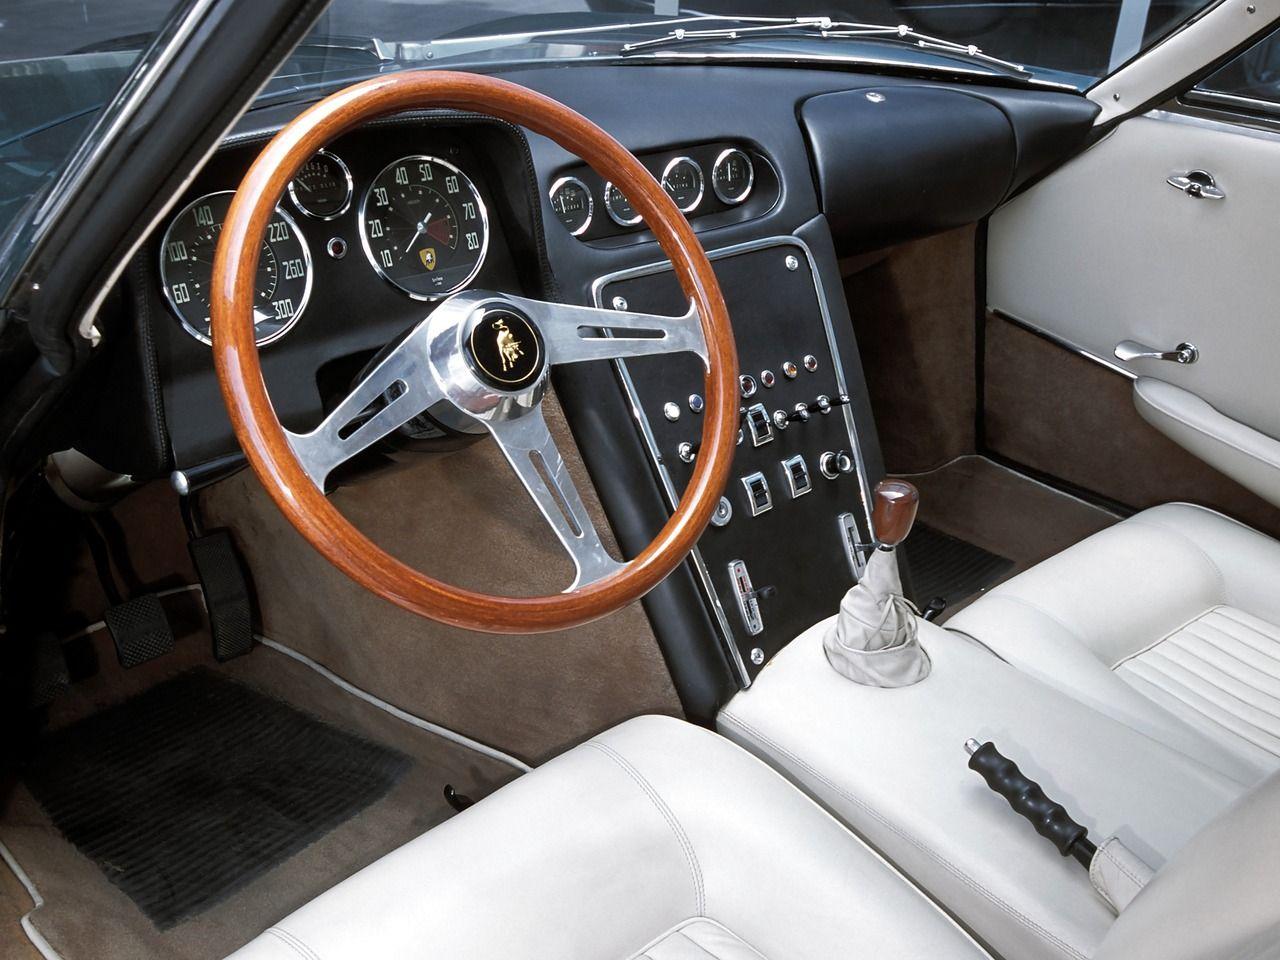 1963 Lamborghini 350 Gtv Lamborghini Car Interior Classic Cars